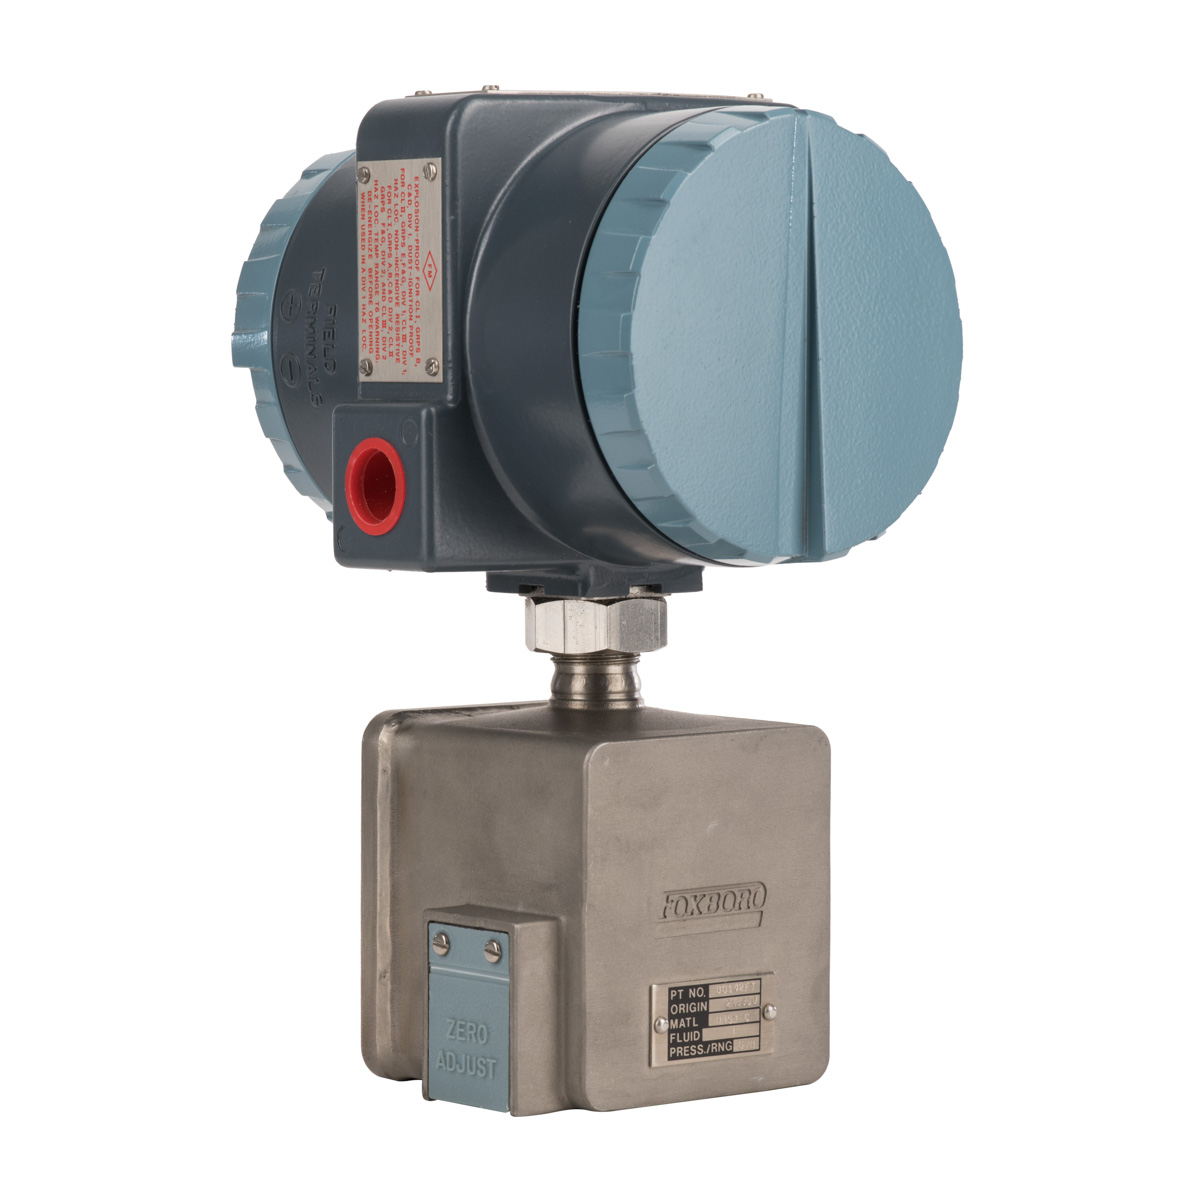 Foxboro 821GM 821GH Electronic Gauge Pressure Transmitter